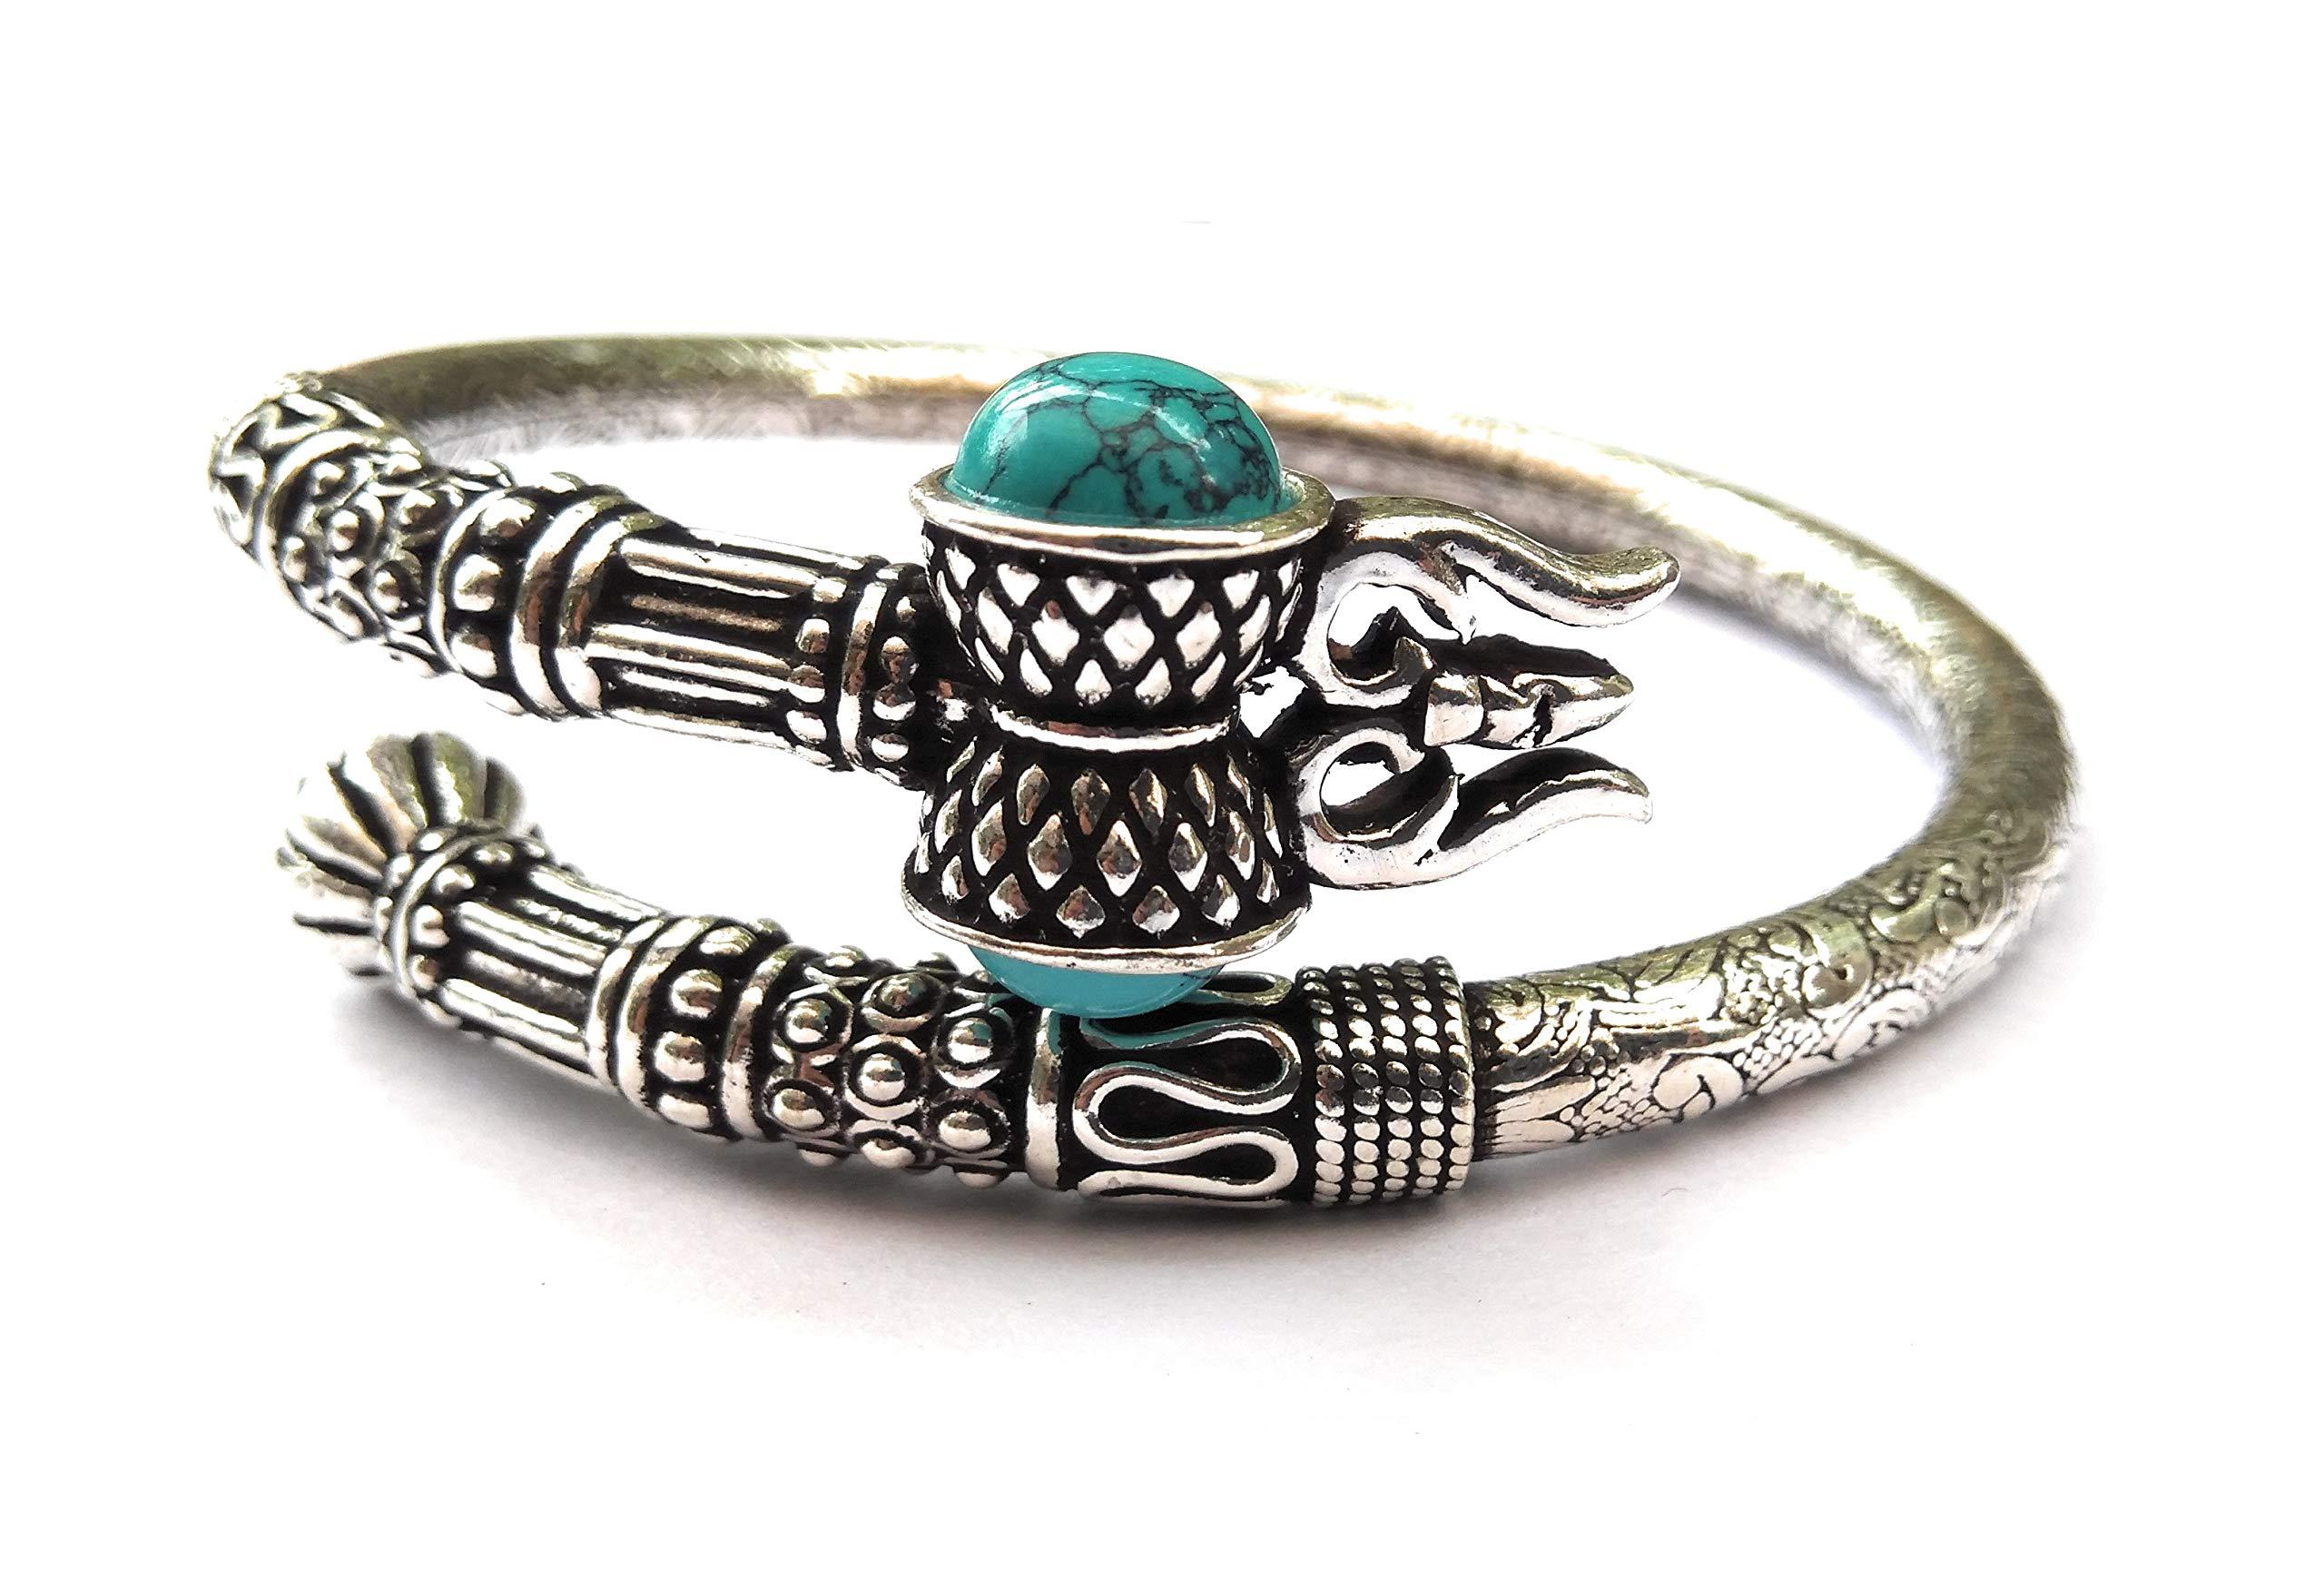 KUKSHYA 925 Pure Silver Trishul Damroo Designer Kada Bracelet Bangle for Women and Men (Flexible) 43GM Approx product image